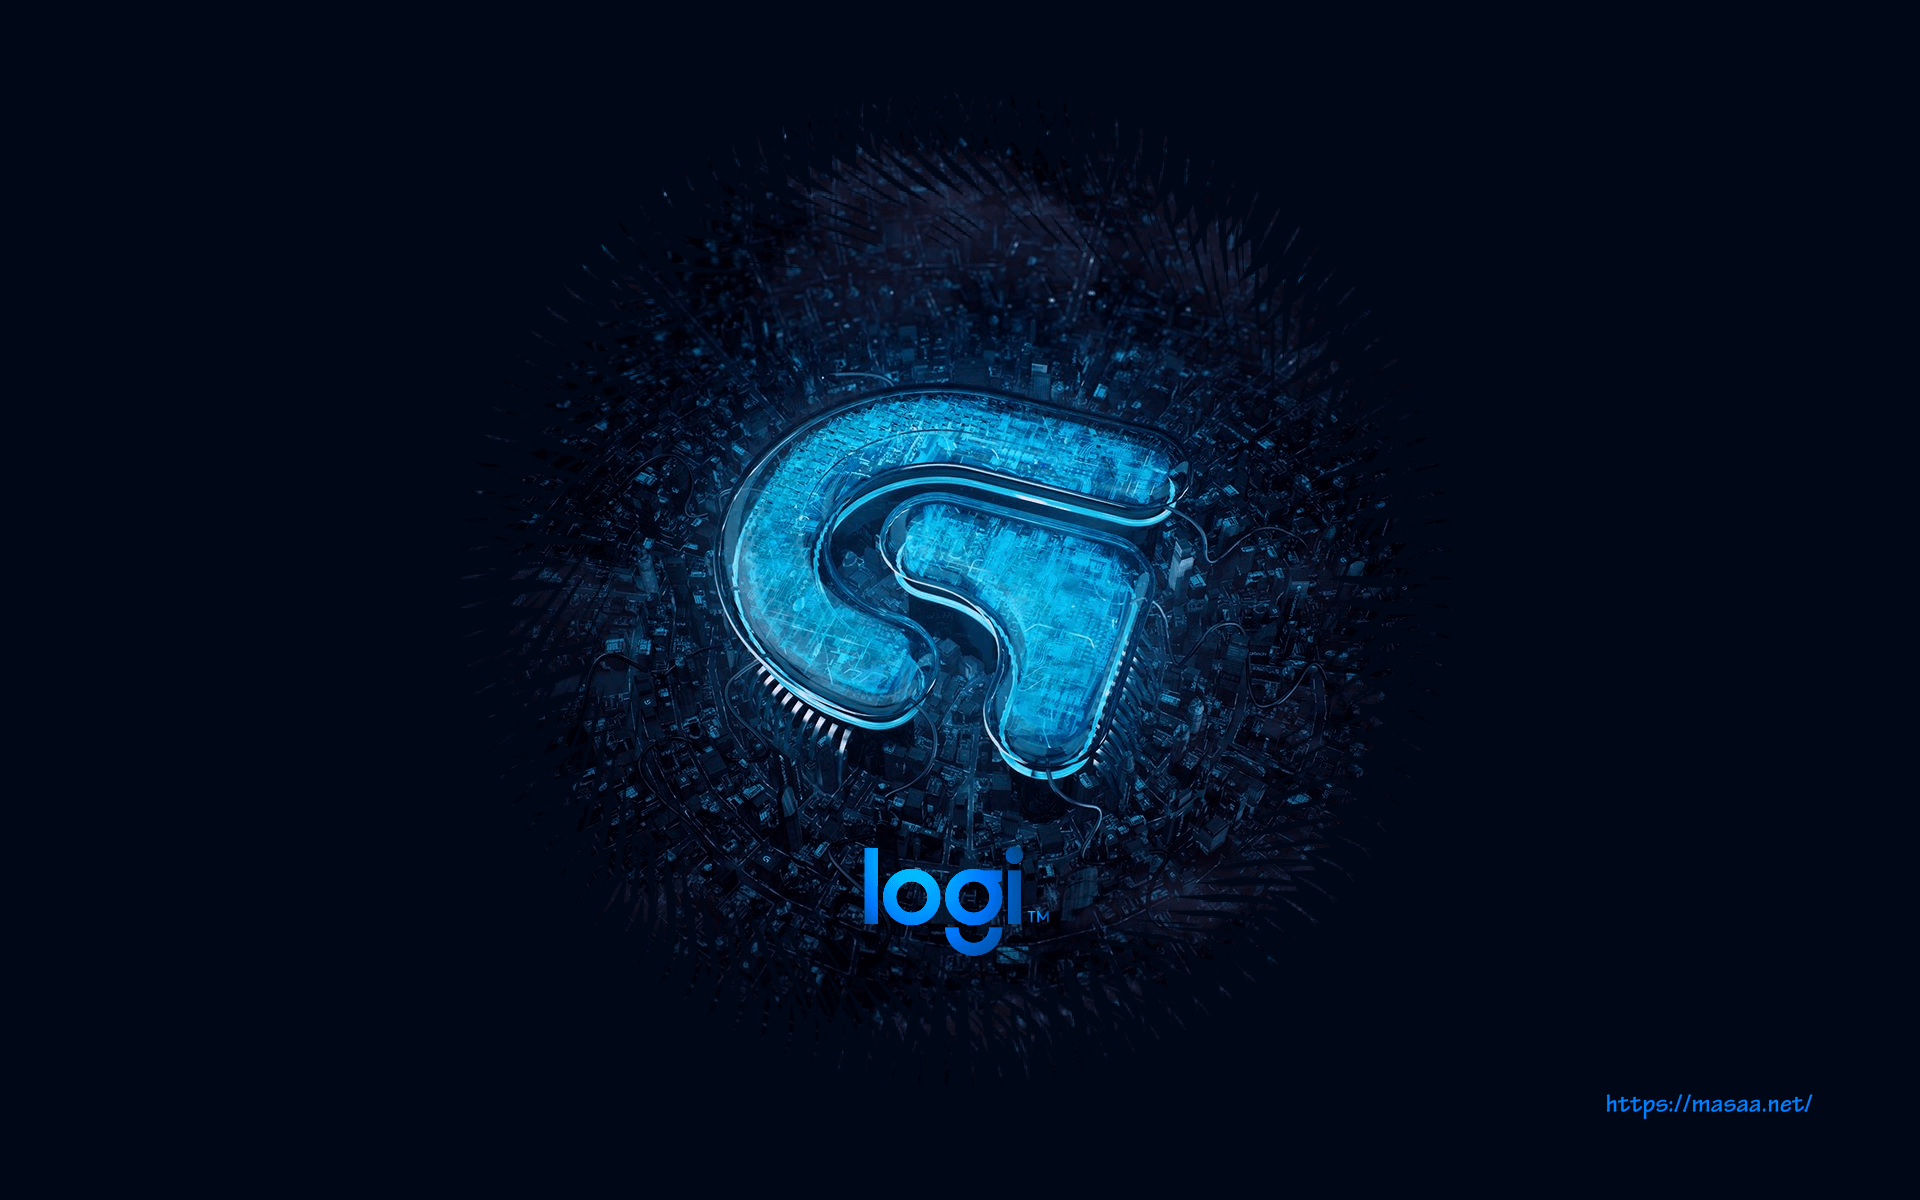 Logi Logicool Logitech 壁紙 Masaa Net